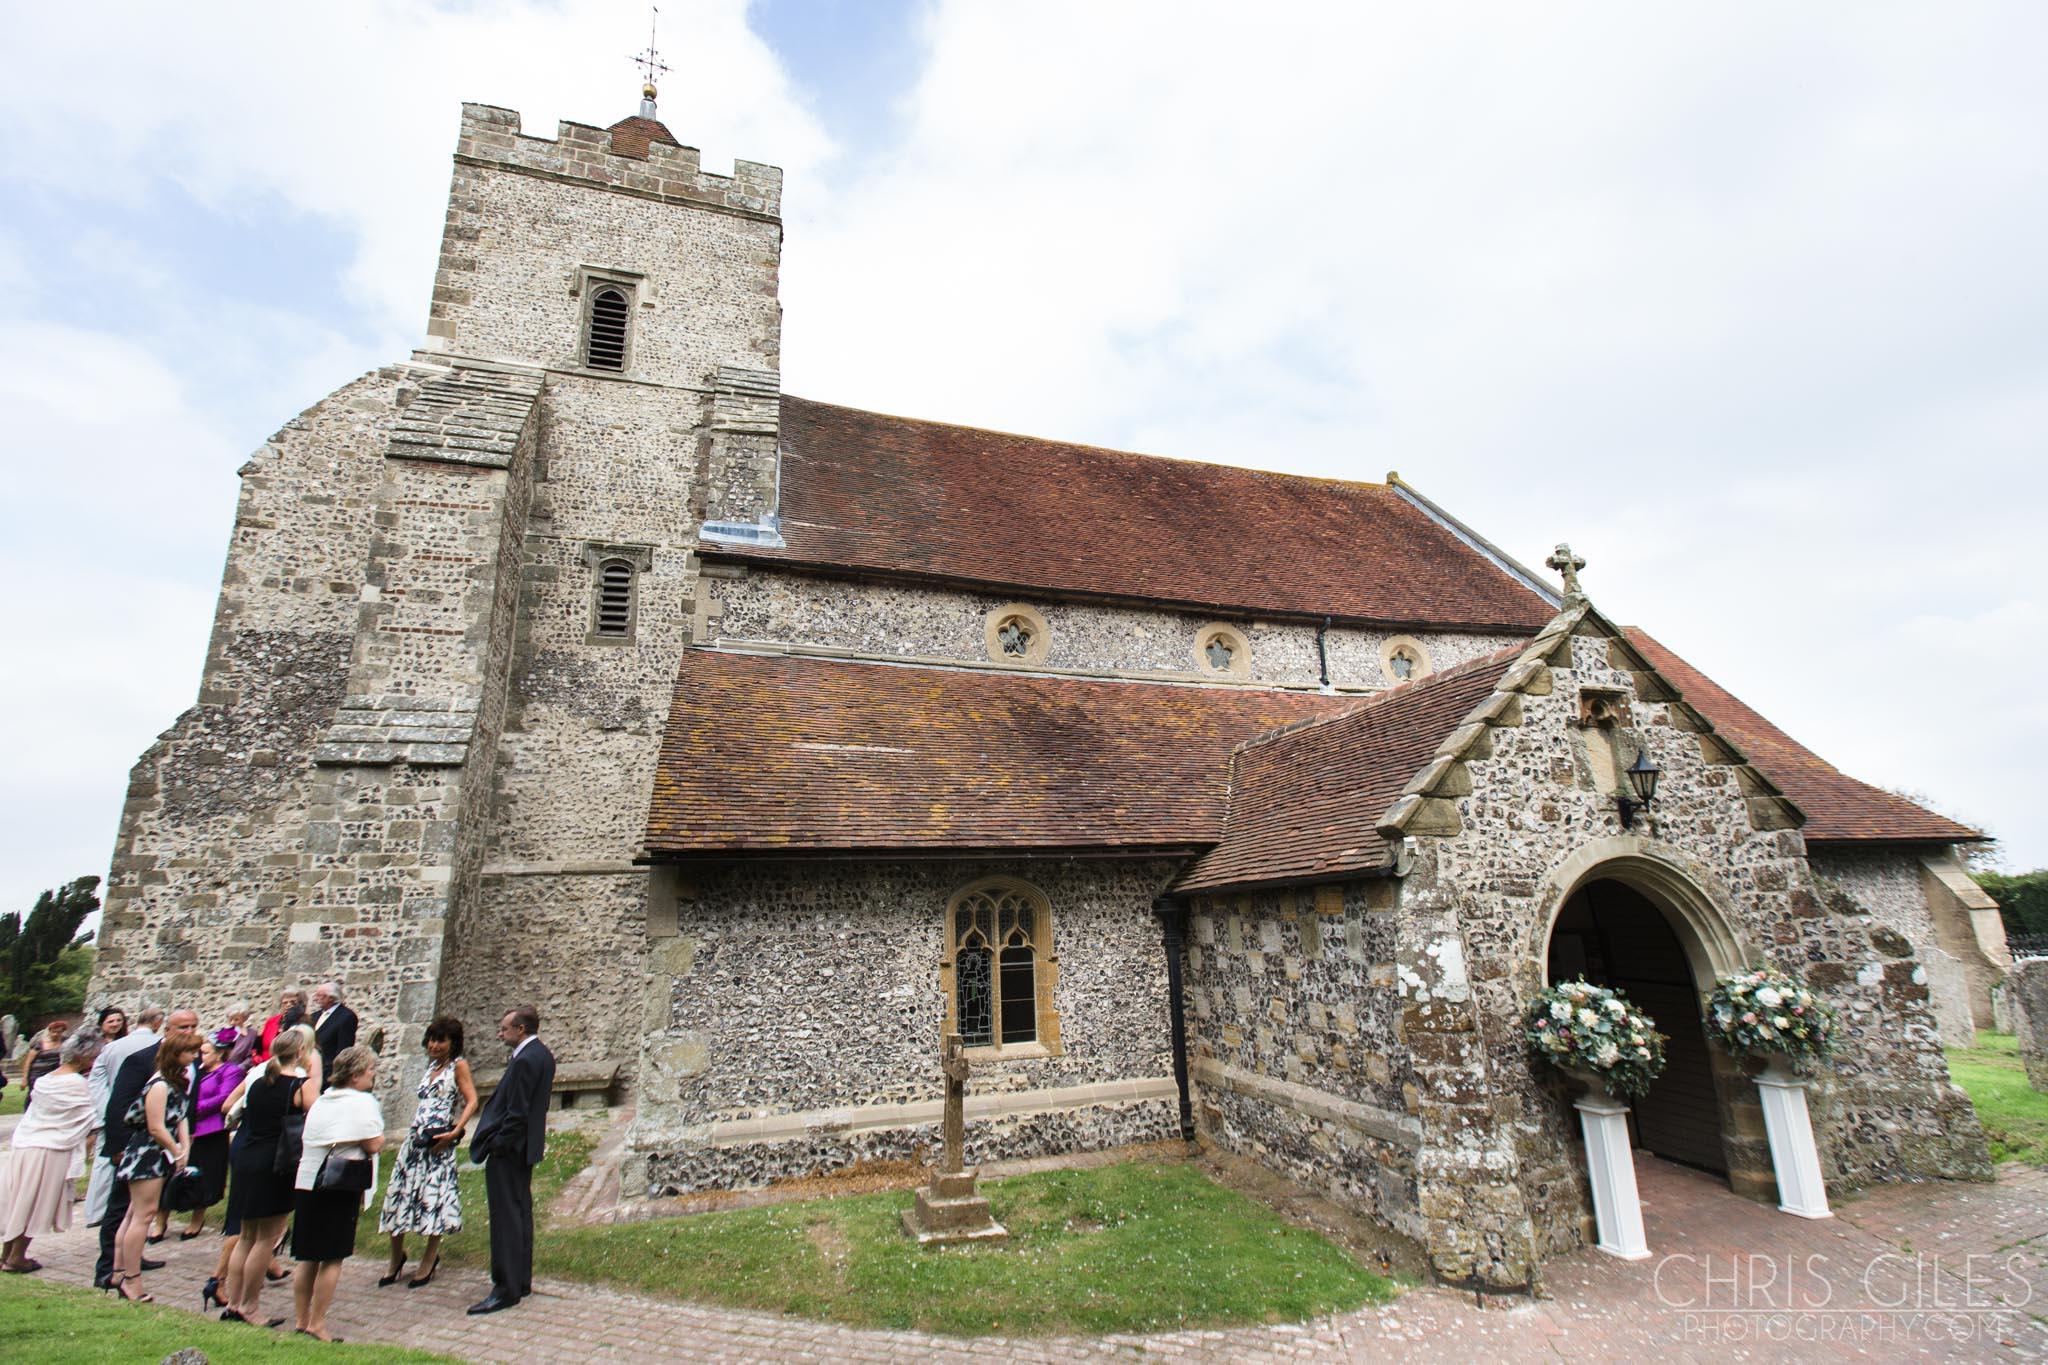 A Firle Church Wedding Amp Firle Place Reception Chris